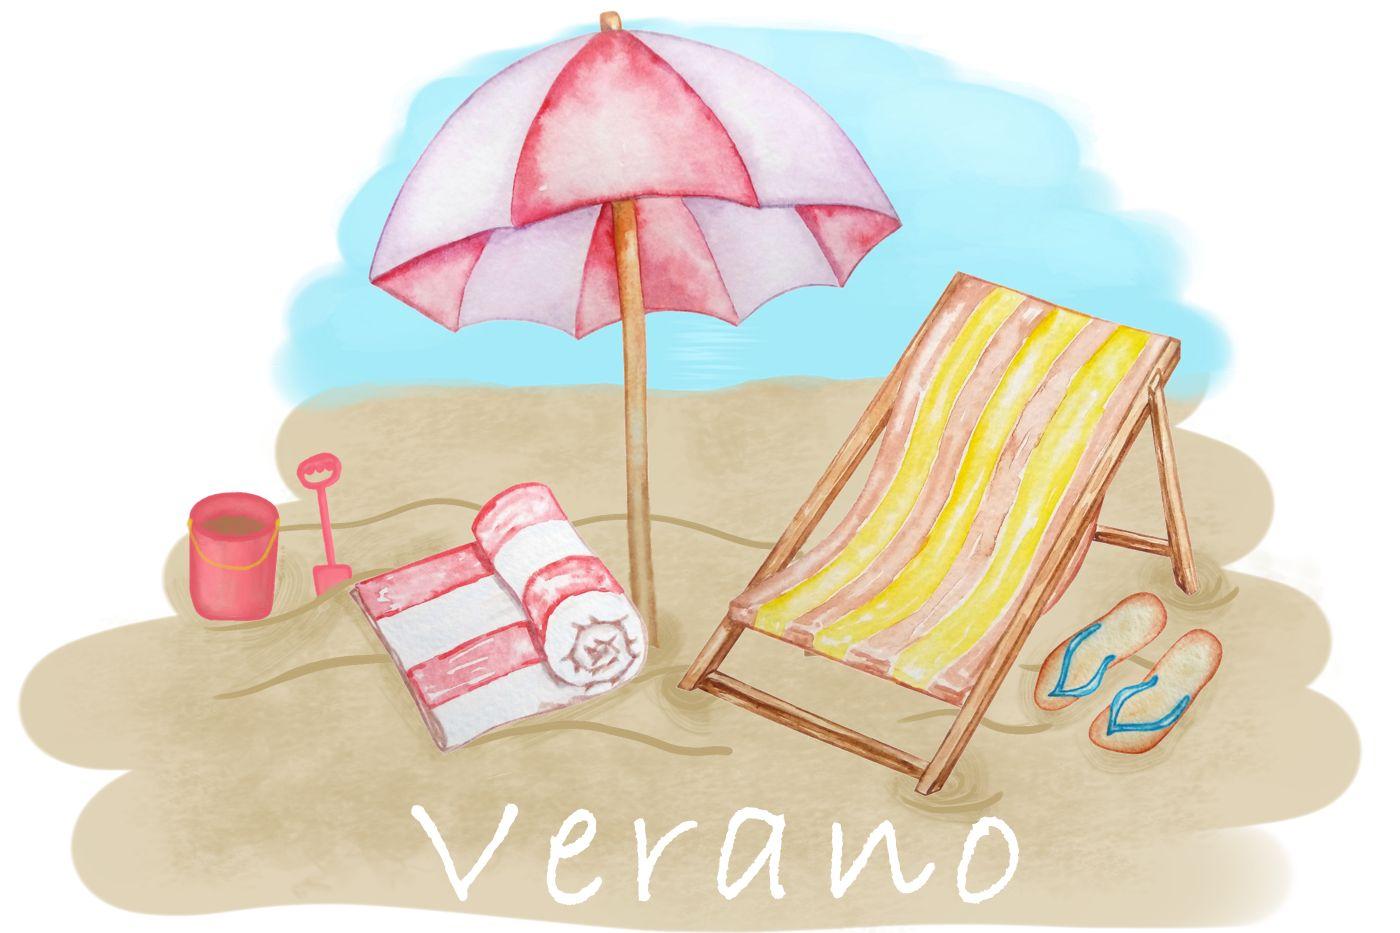 Dibujo verano